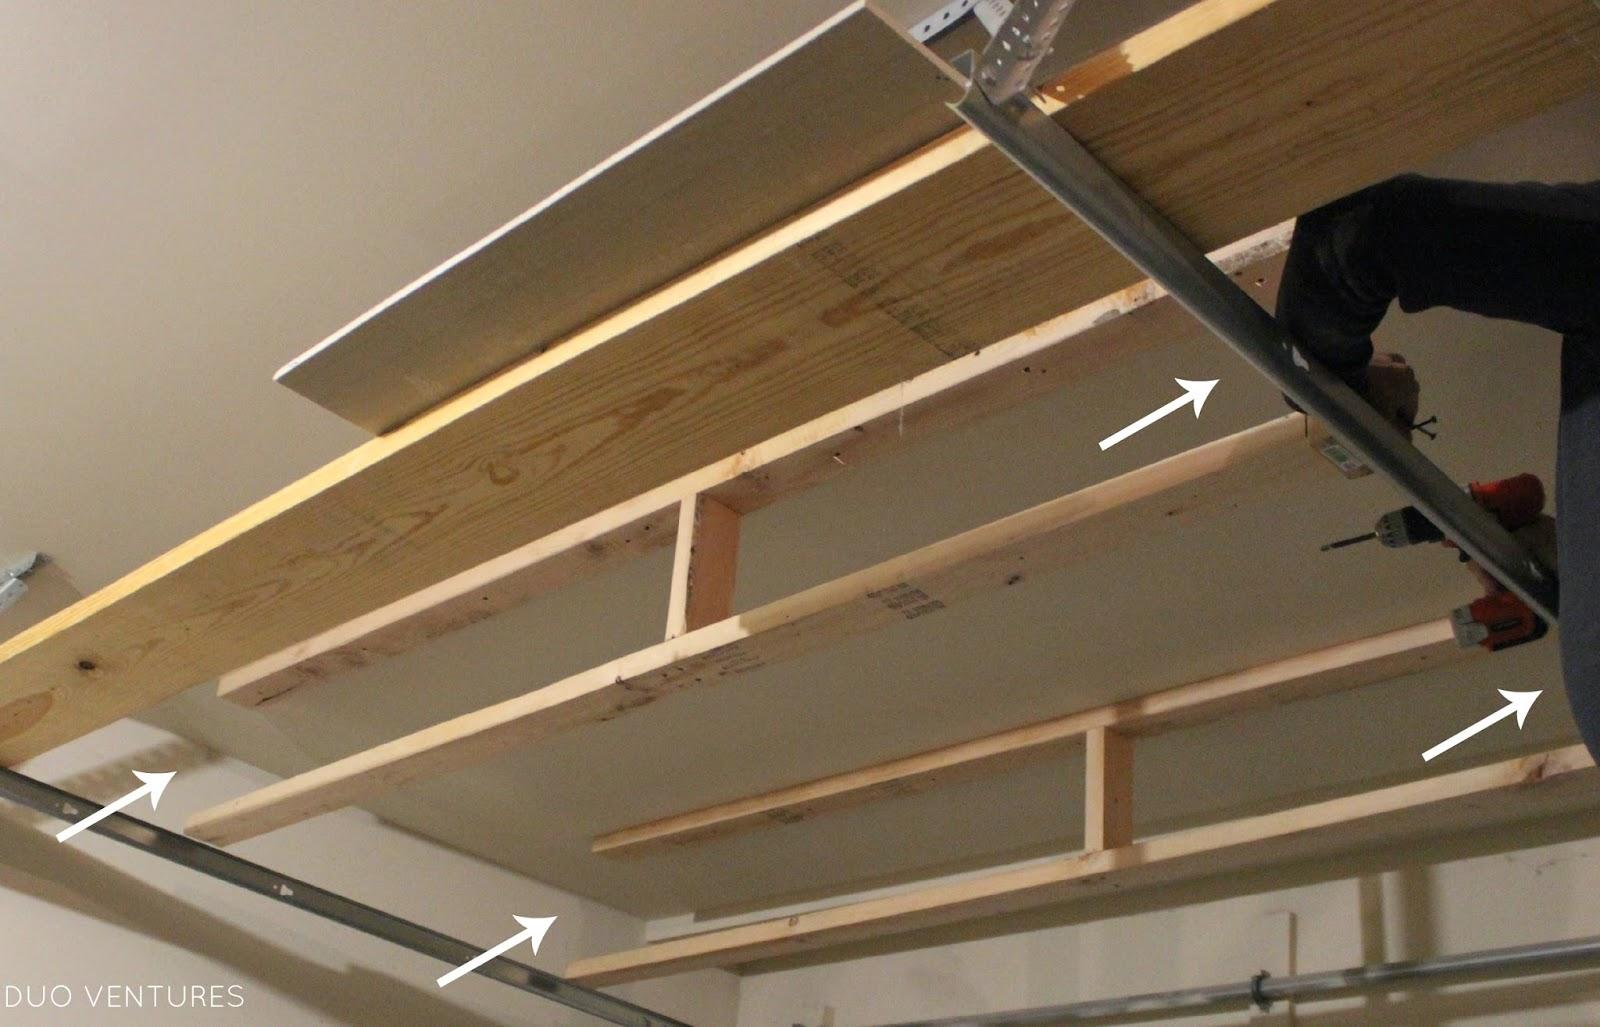 Duo Ventures The Garage Ceiling Storage